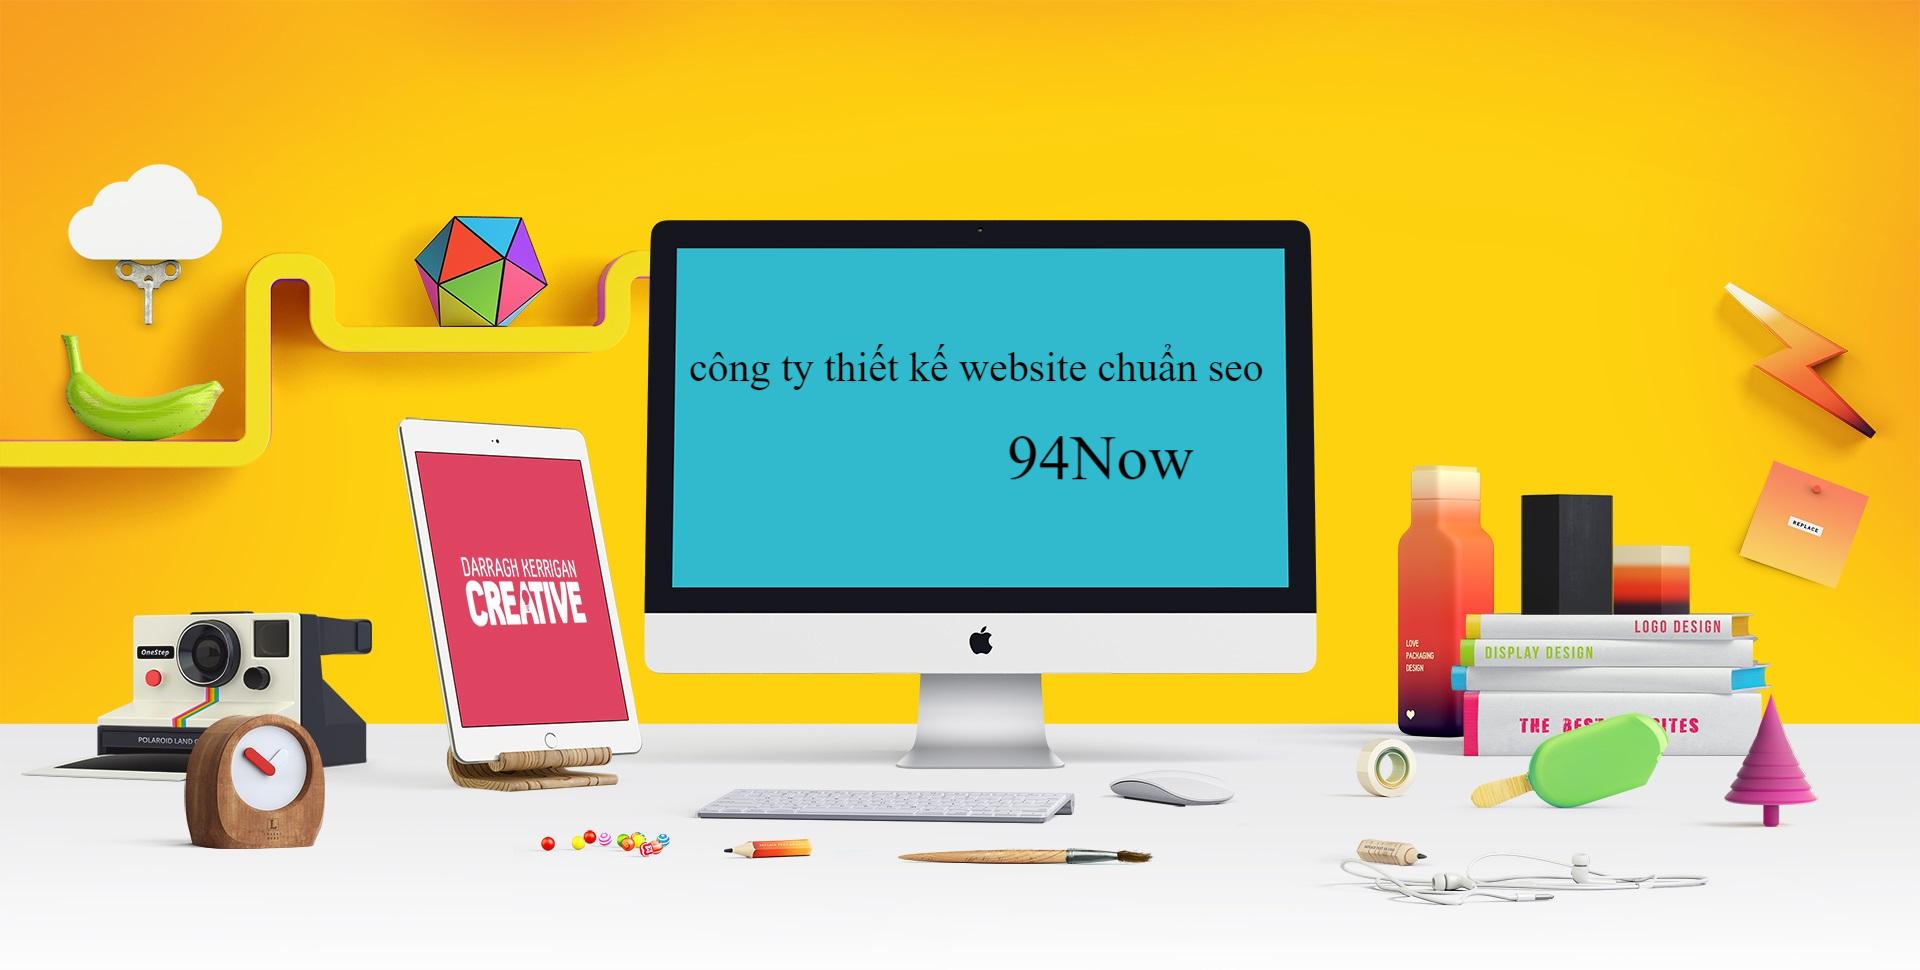 cong-ty-thiet-ke-website-chuan-seo-94Now